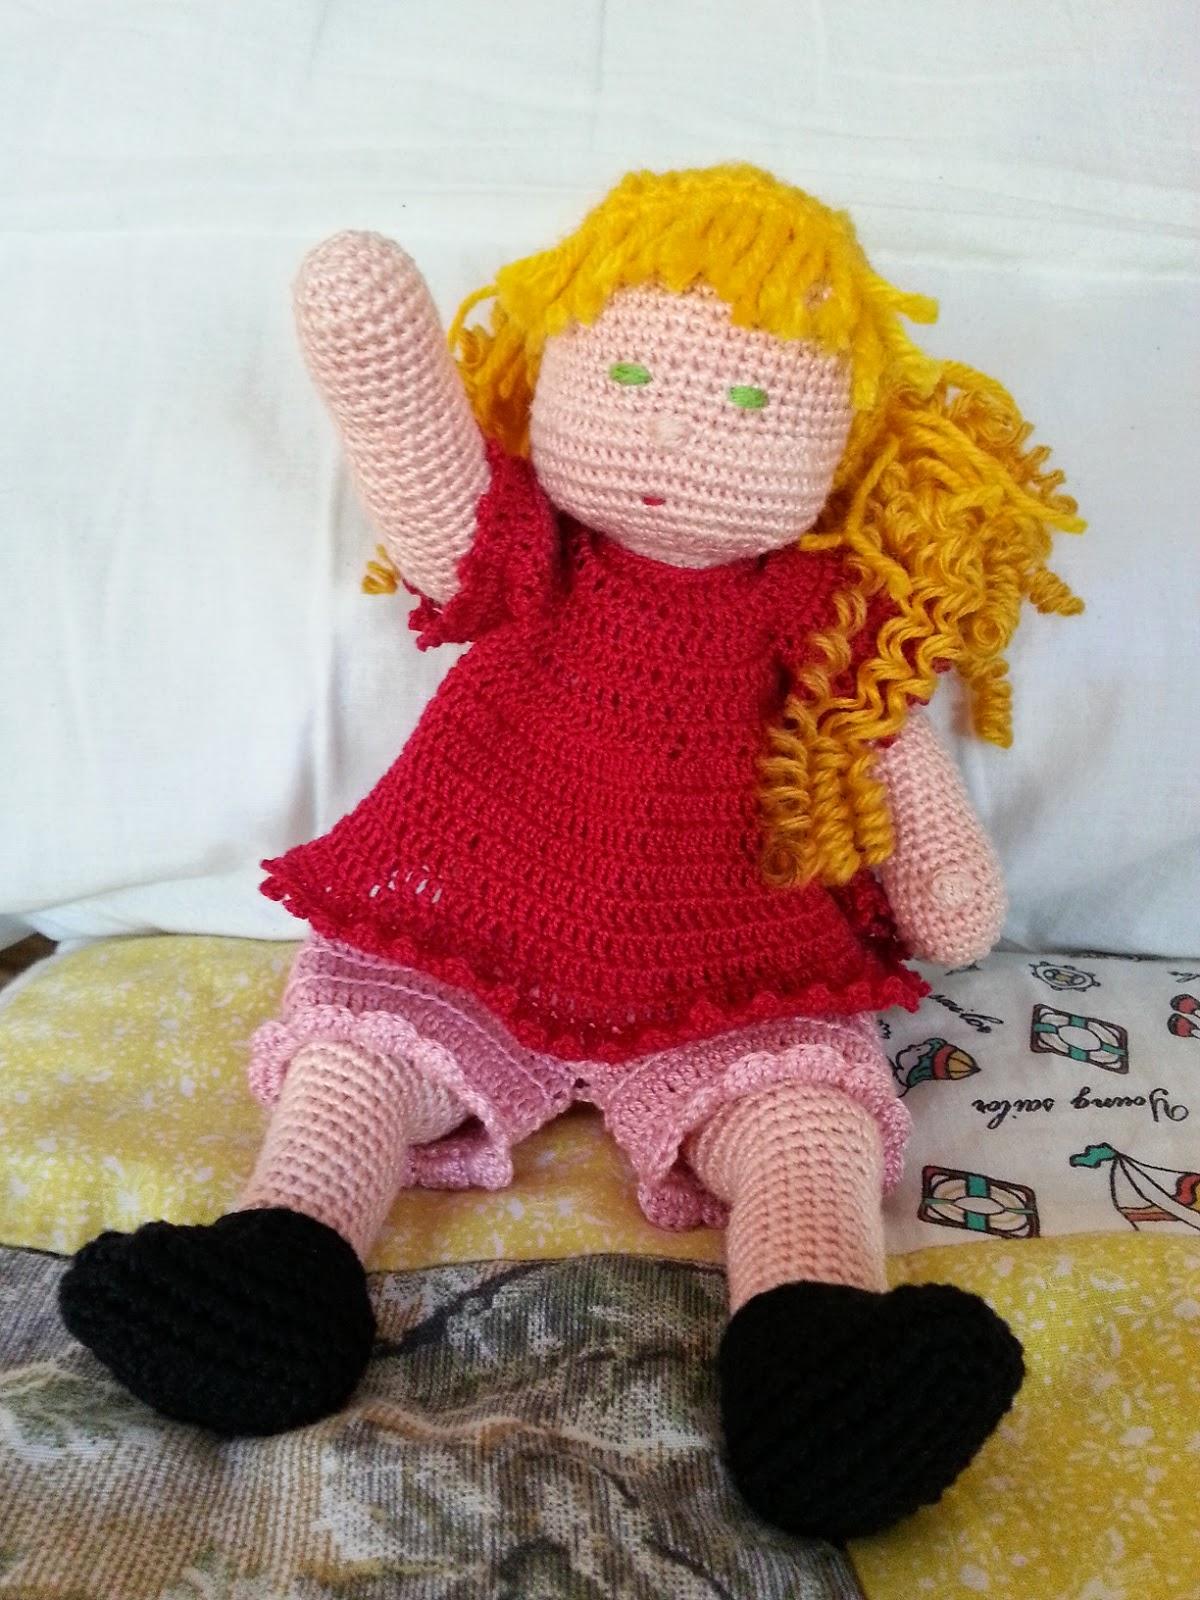 Muñeca Amigurumi Articulada | Bonecas, Bonecas de crochê, Boneca ... | 1600x1200